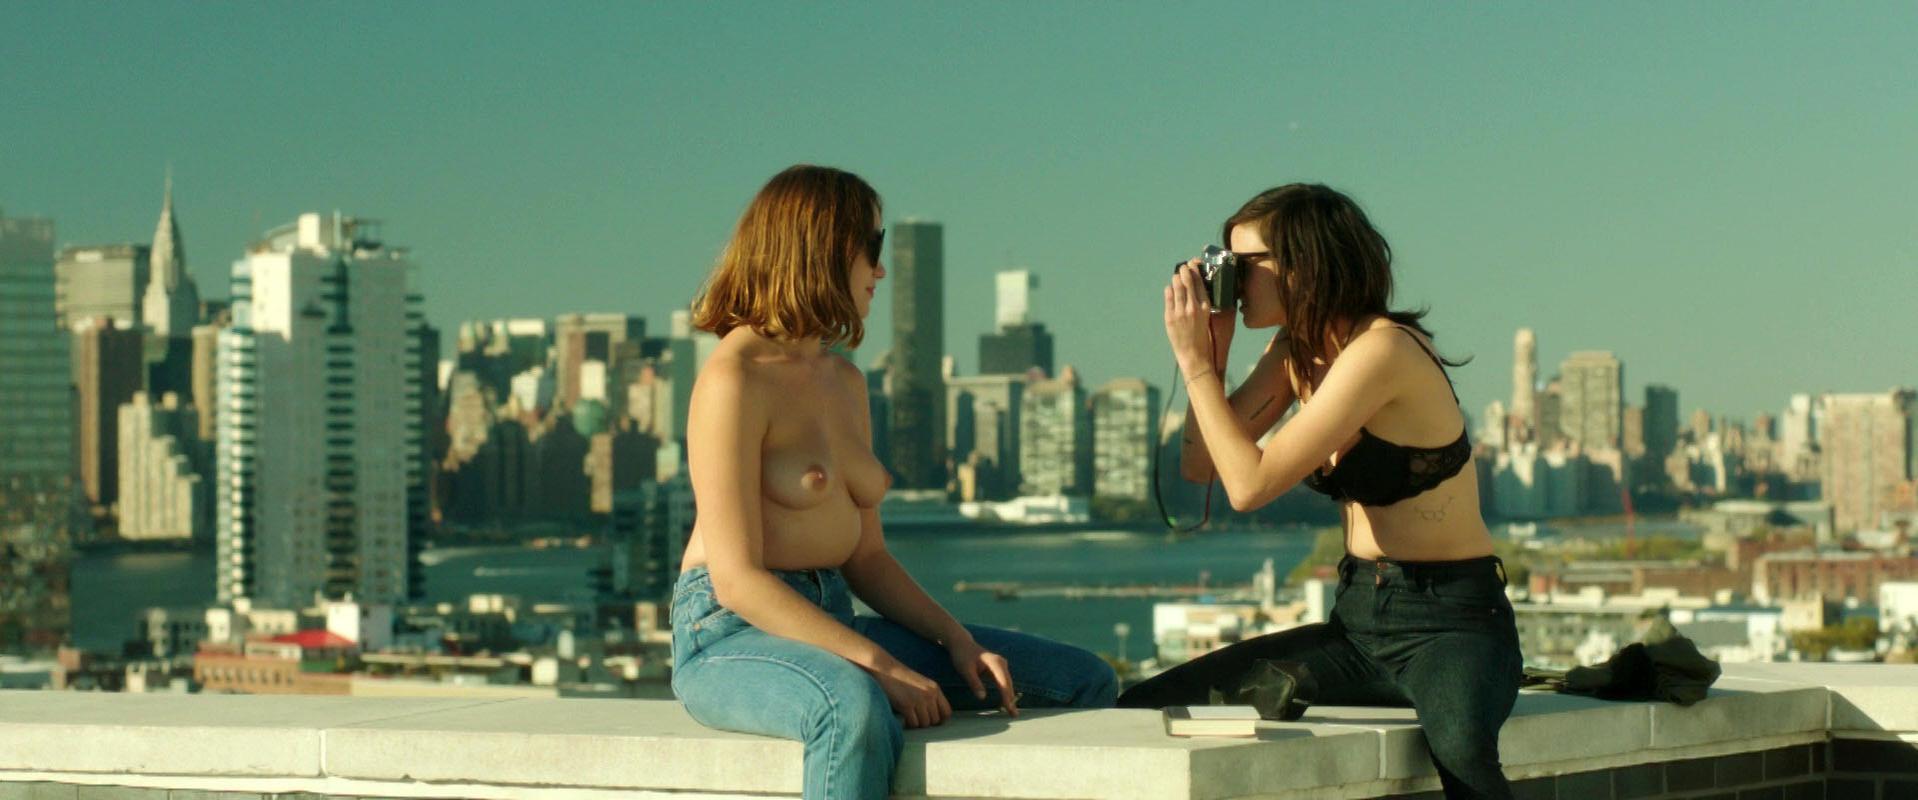 Lina Esco nude, Lola Kirke nude - Free the Nipple (2014)